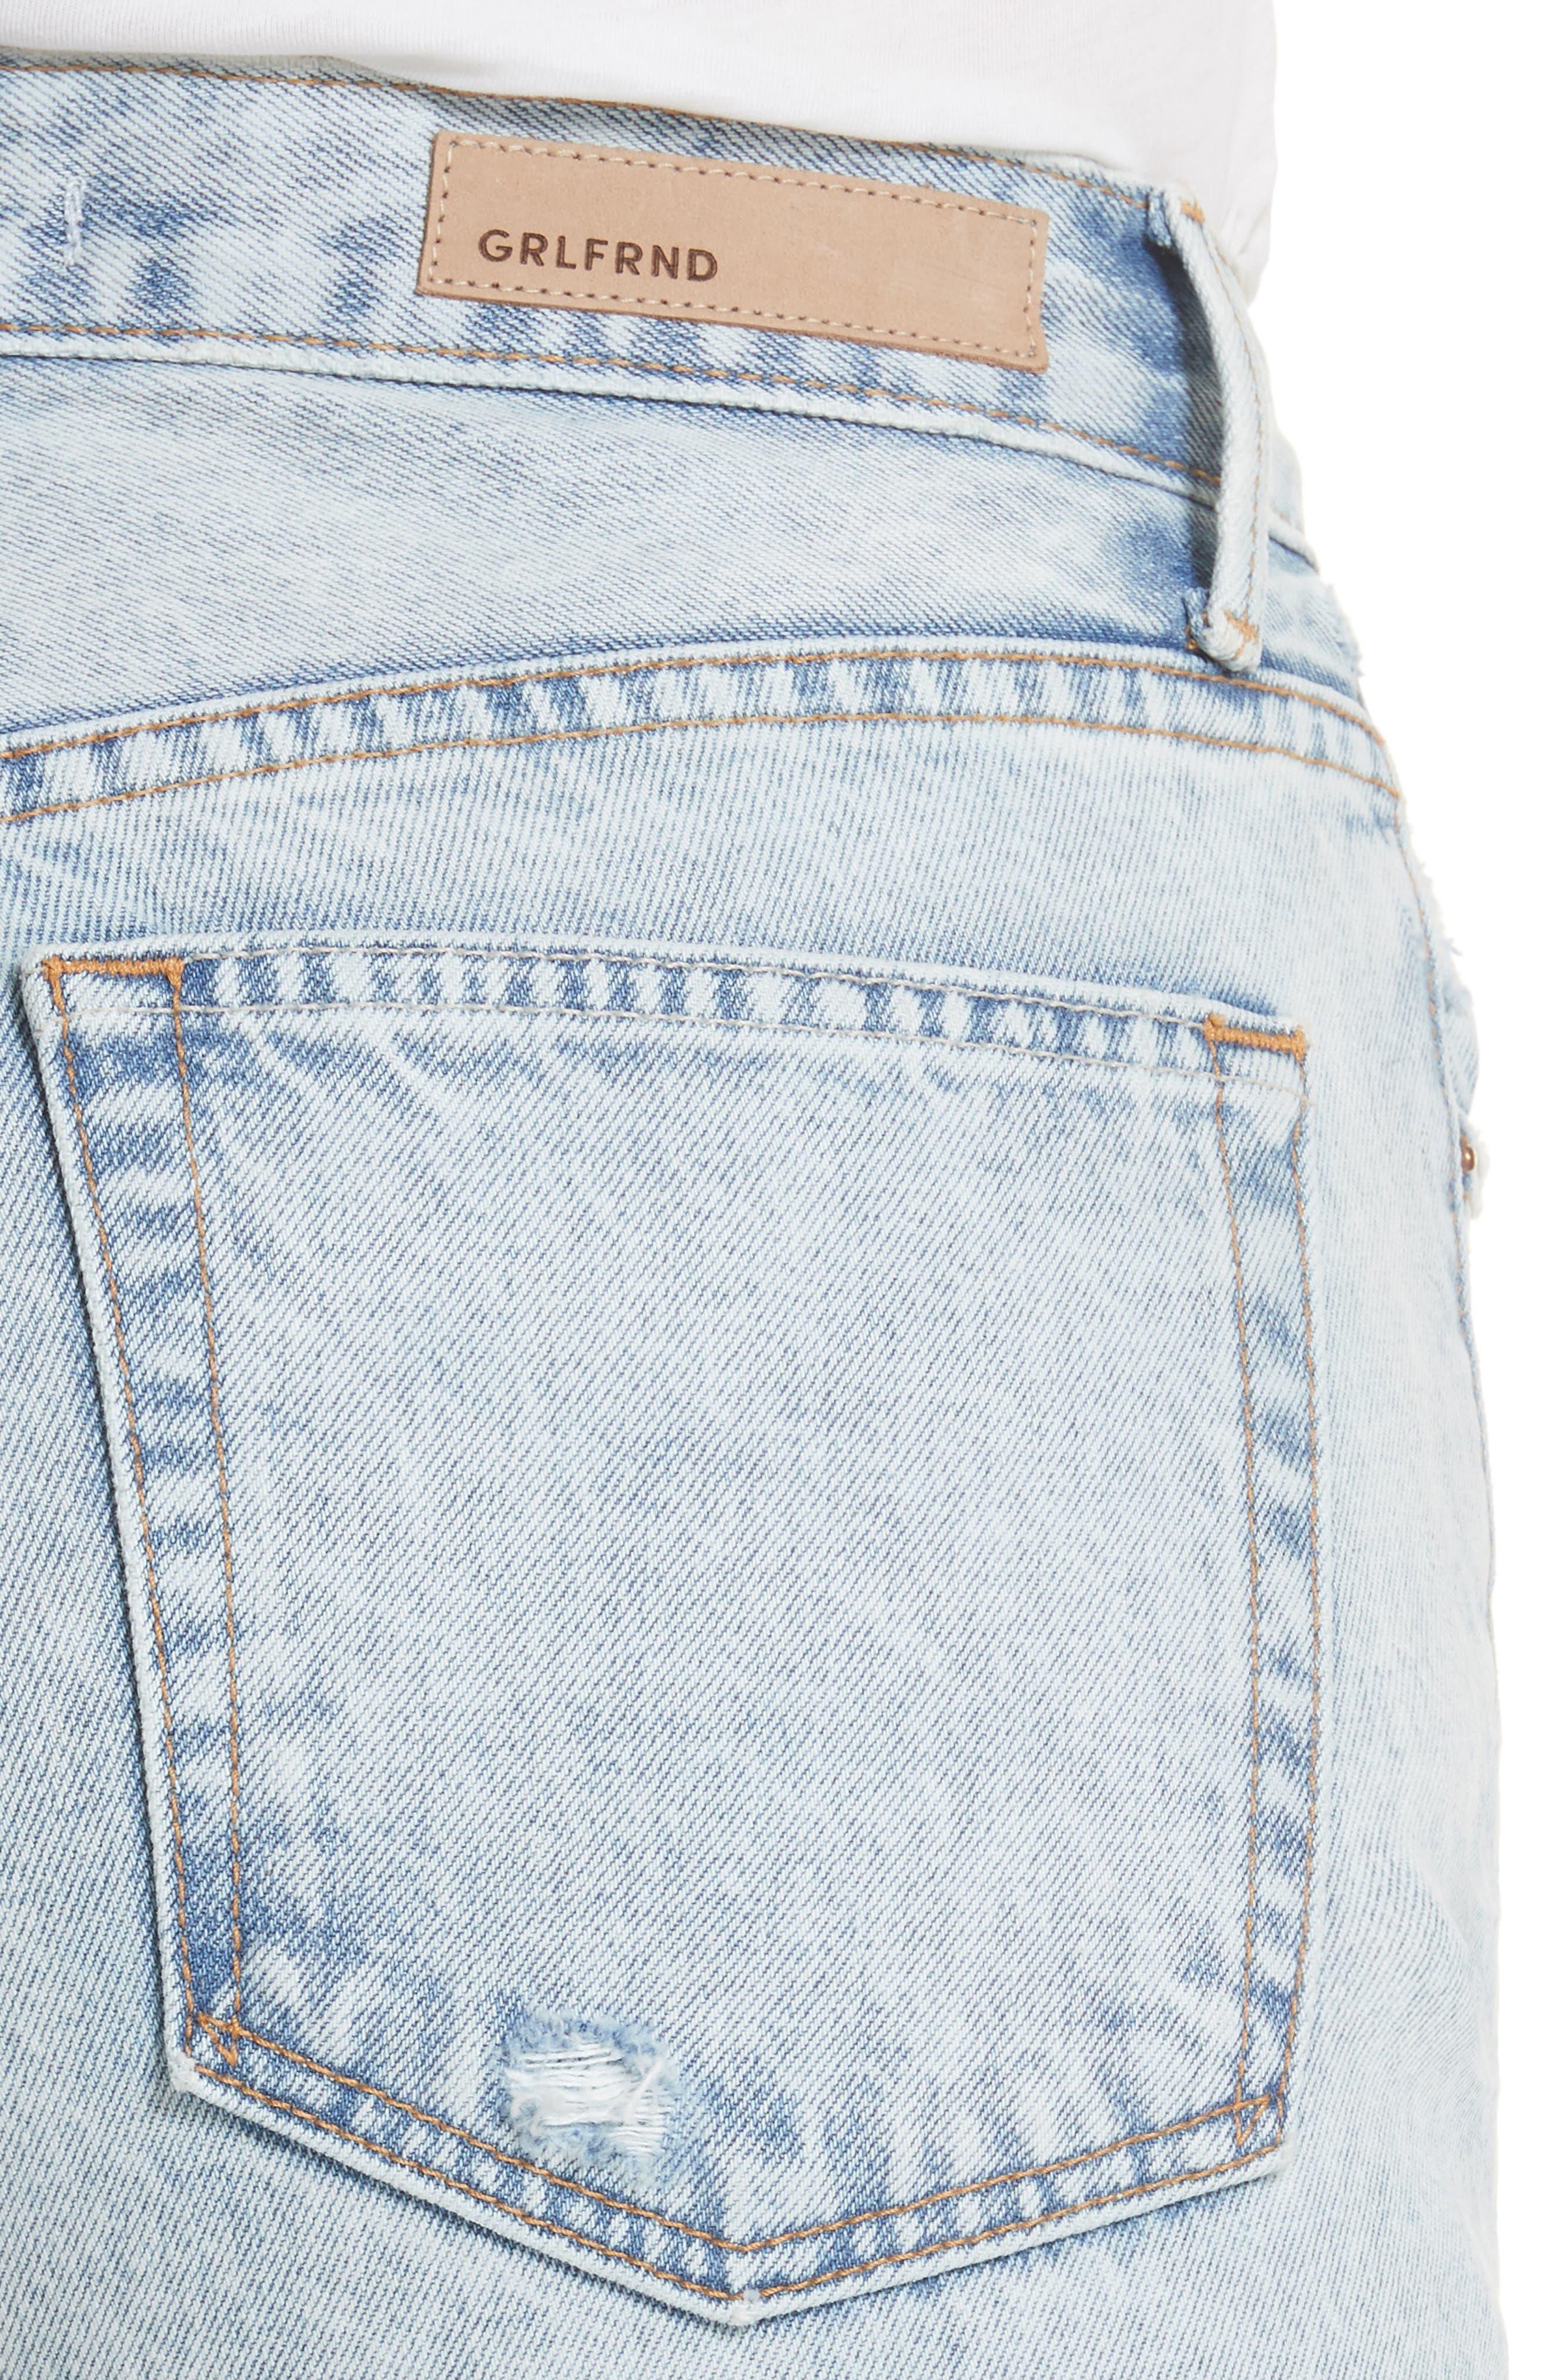 Karolina Ripped Skinny Jeans,                             Alternate thumbnail 4, color,                             487